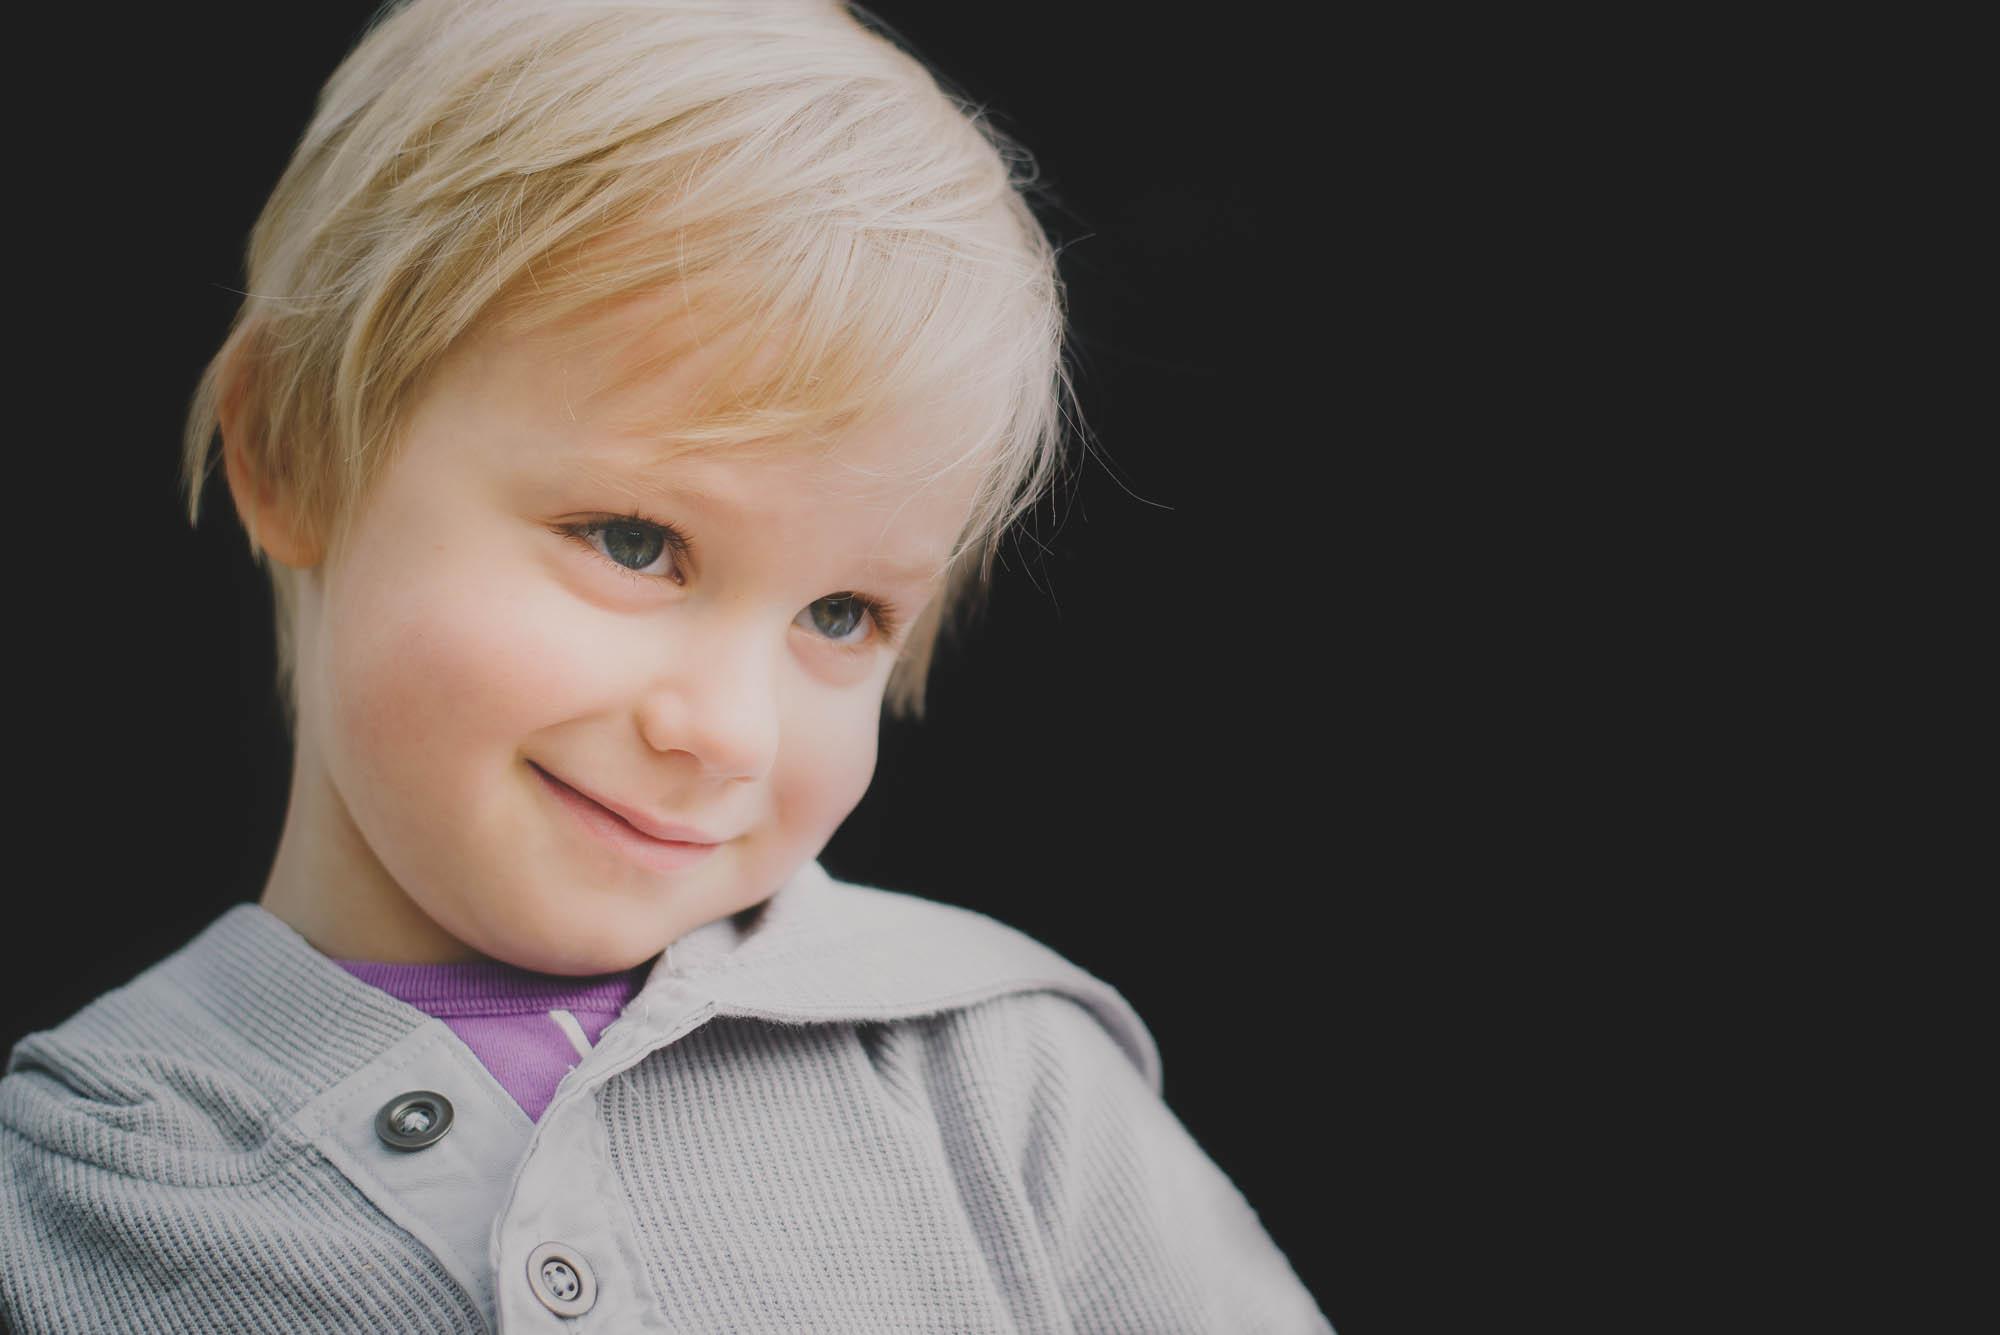 melbourne_family_photographer_childhood_portraits_smiling_boy.jpg